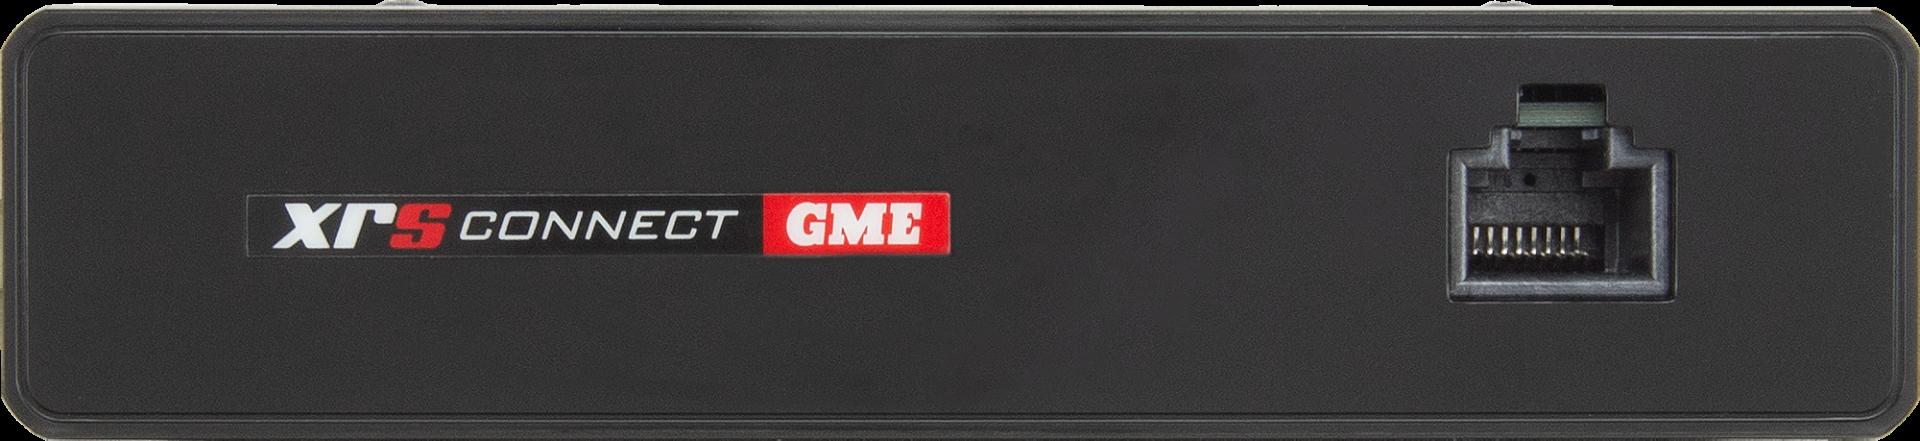 GME XRS-370C -